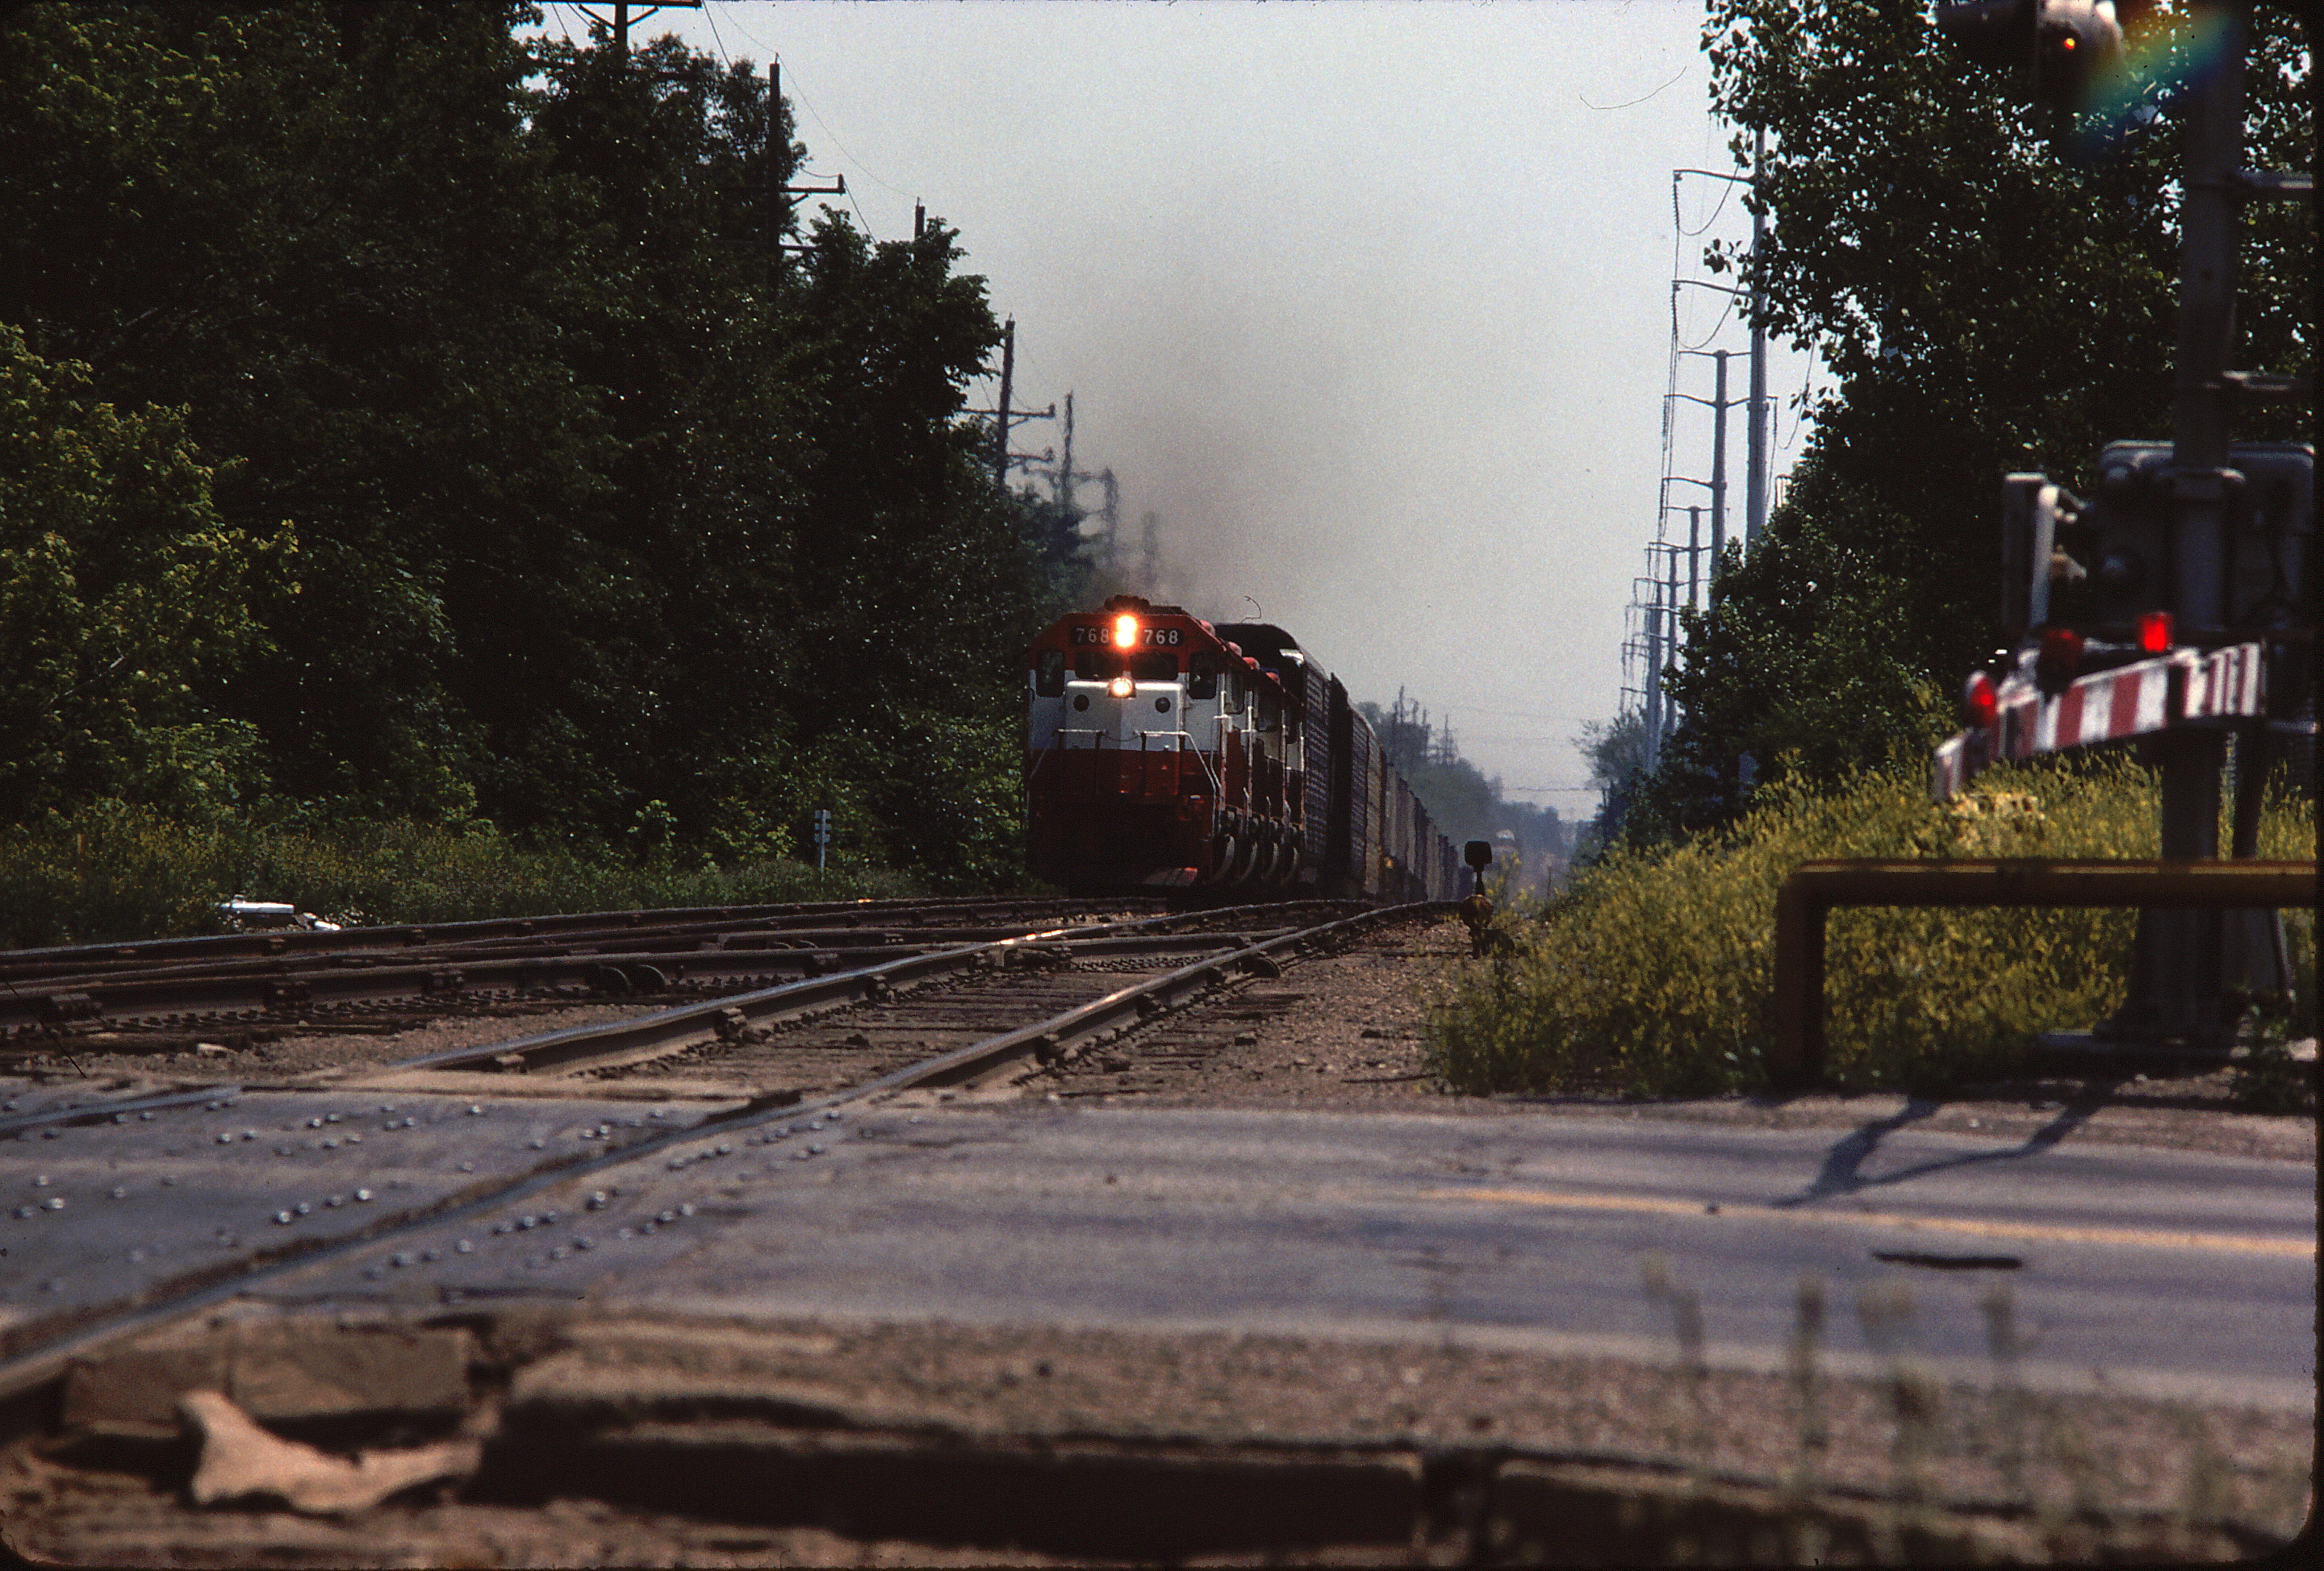 GP40-2 768 at Kirkwood, Missouri in May 1980 (Ken McElreath)